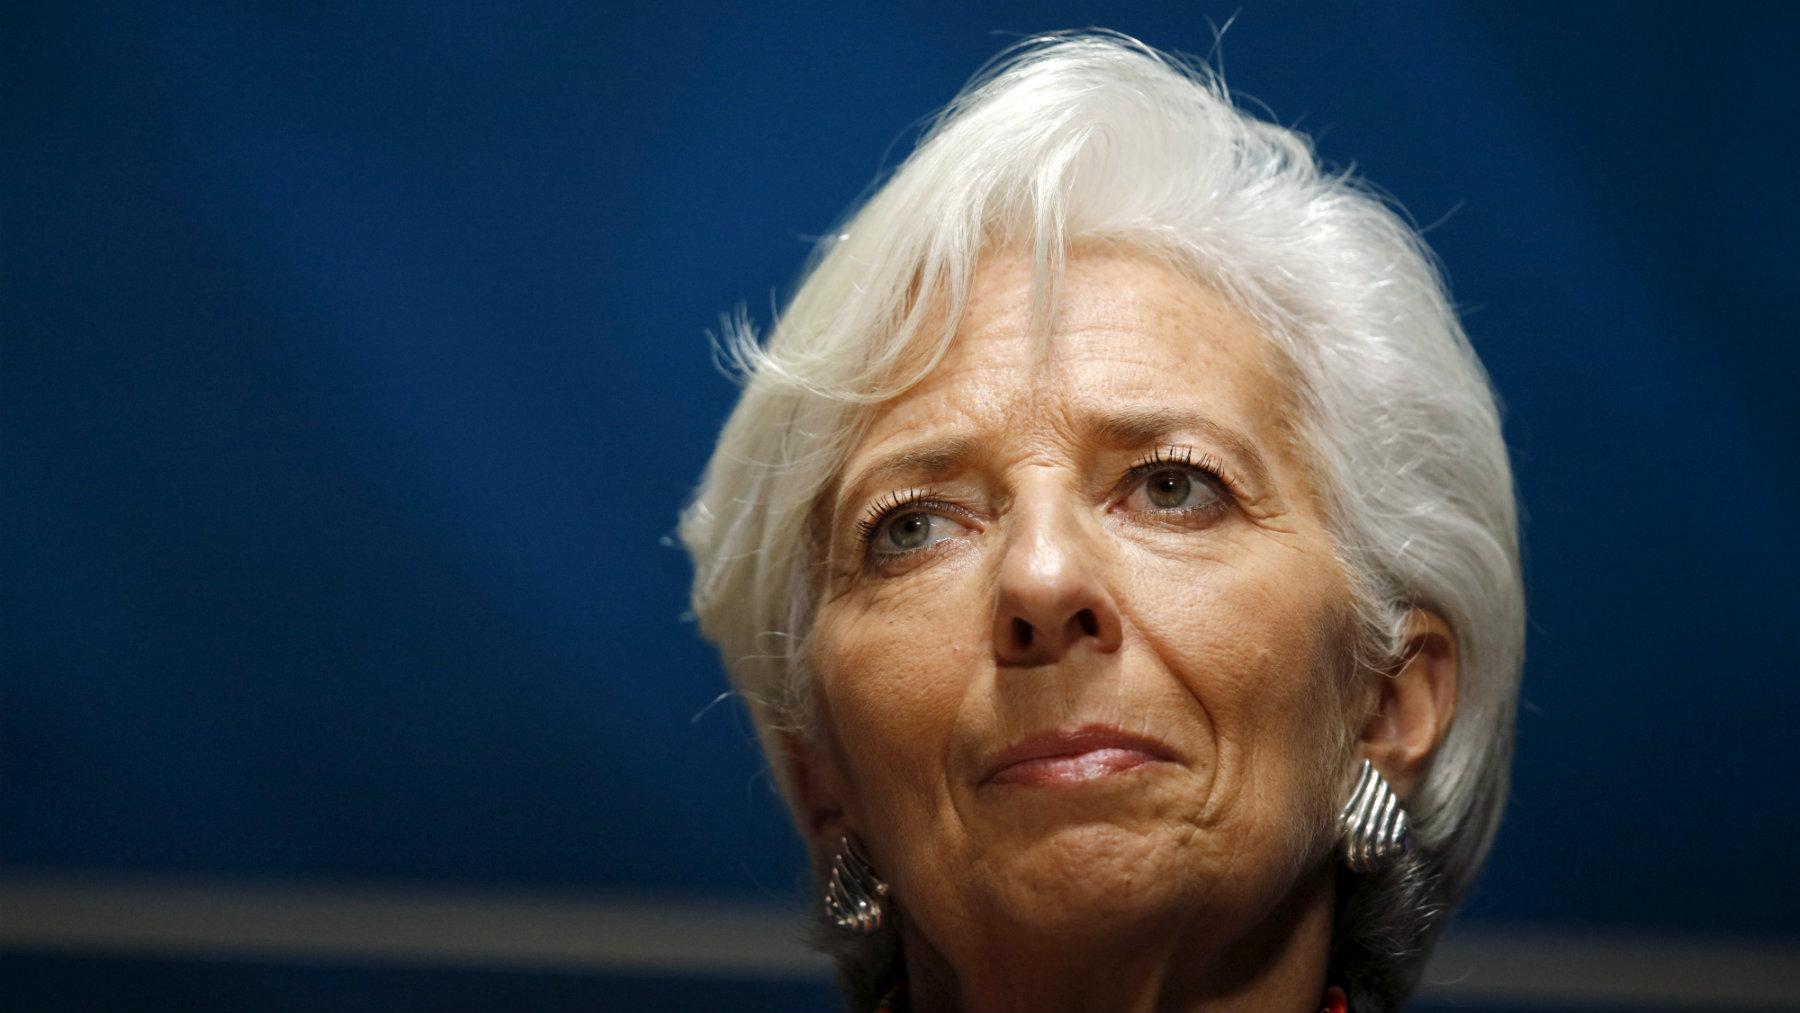 International Monetary Fund (IMF) Managing Director Christine Lagarde attends the 2015 IMF/World Bank Annual Meetings in Lima, Peru.